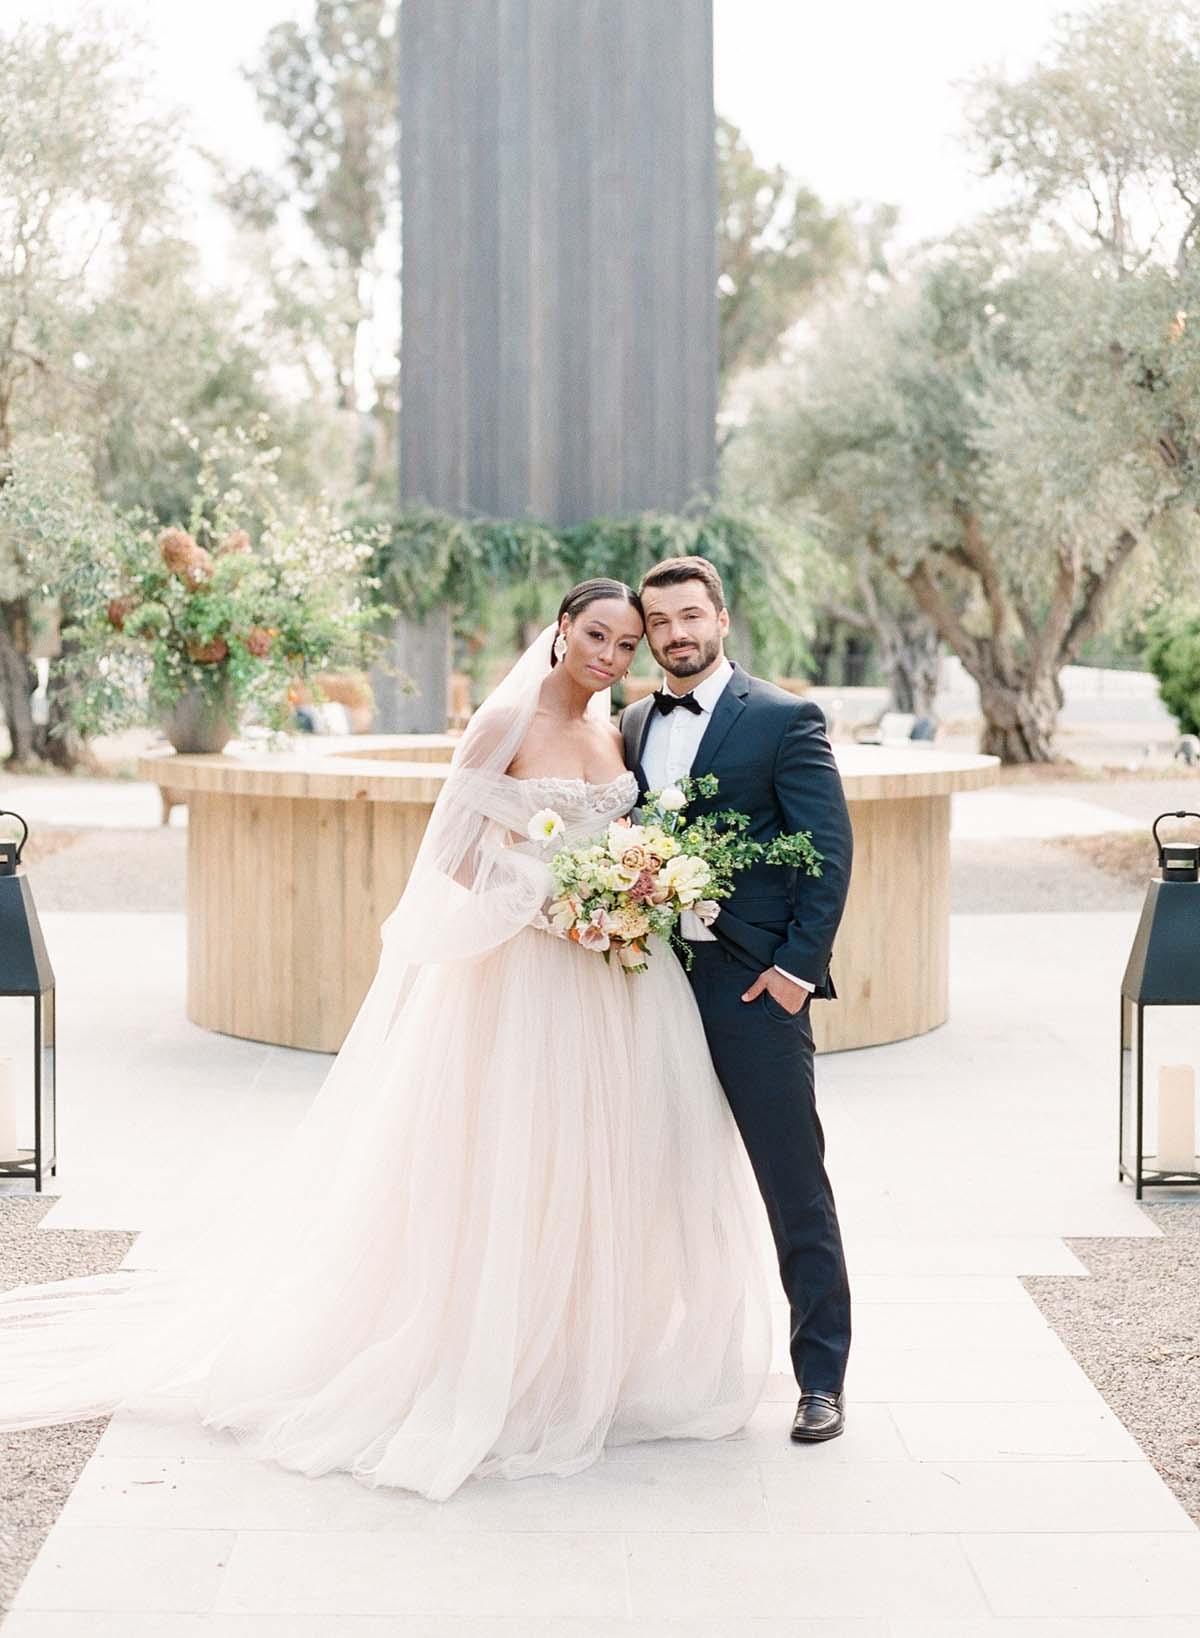 XOXO_BRIDE_Events-Michelle-Beller_Photography_0133